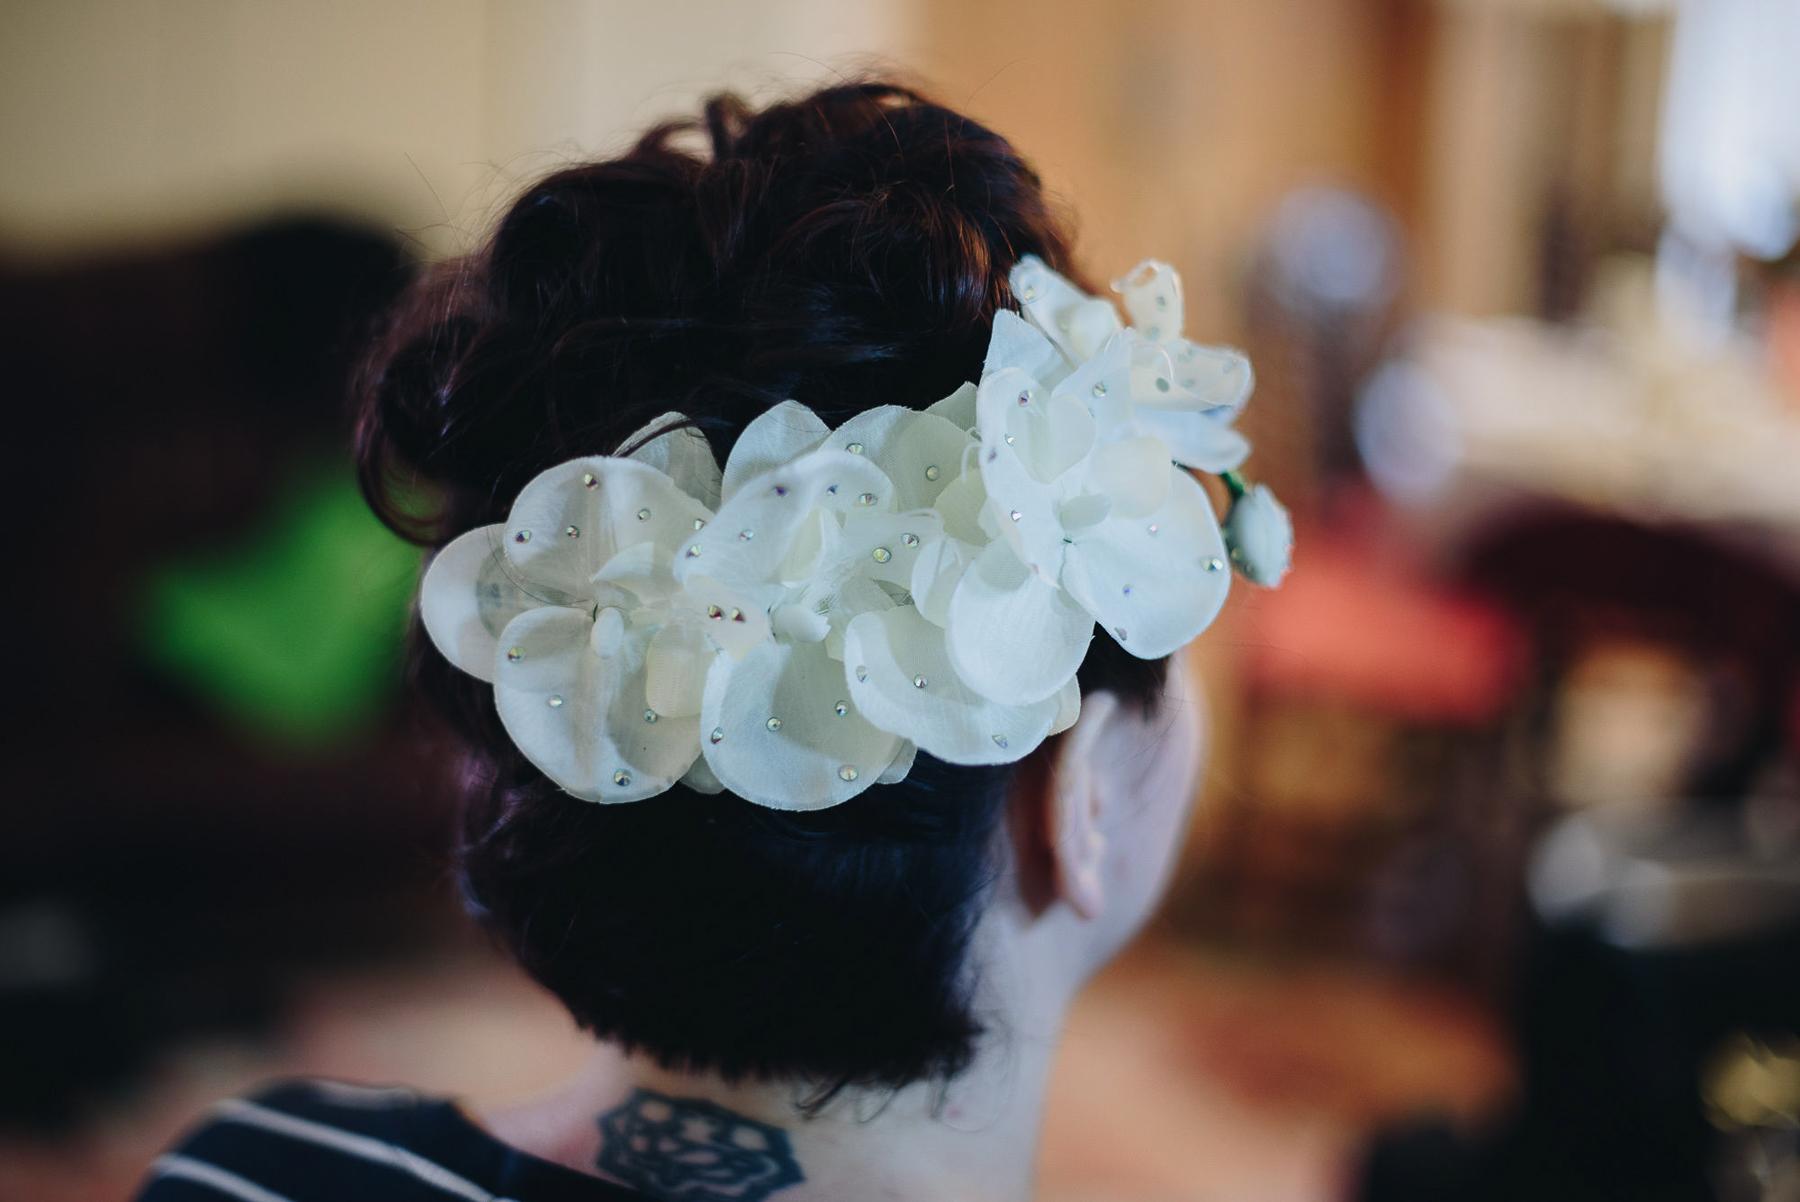 Wellbeing_Farm_Wedding_Photography_The_Pin-Up_Bride_Lara_Shaun-7.jpg